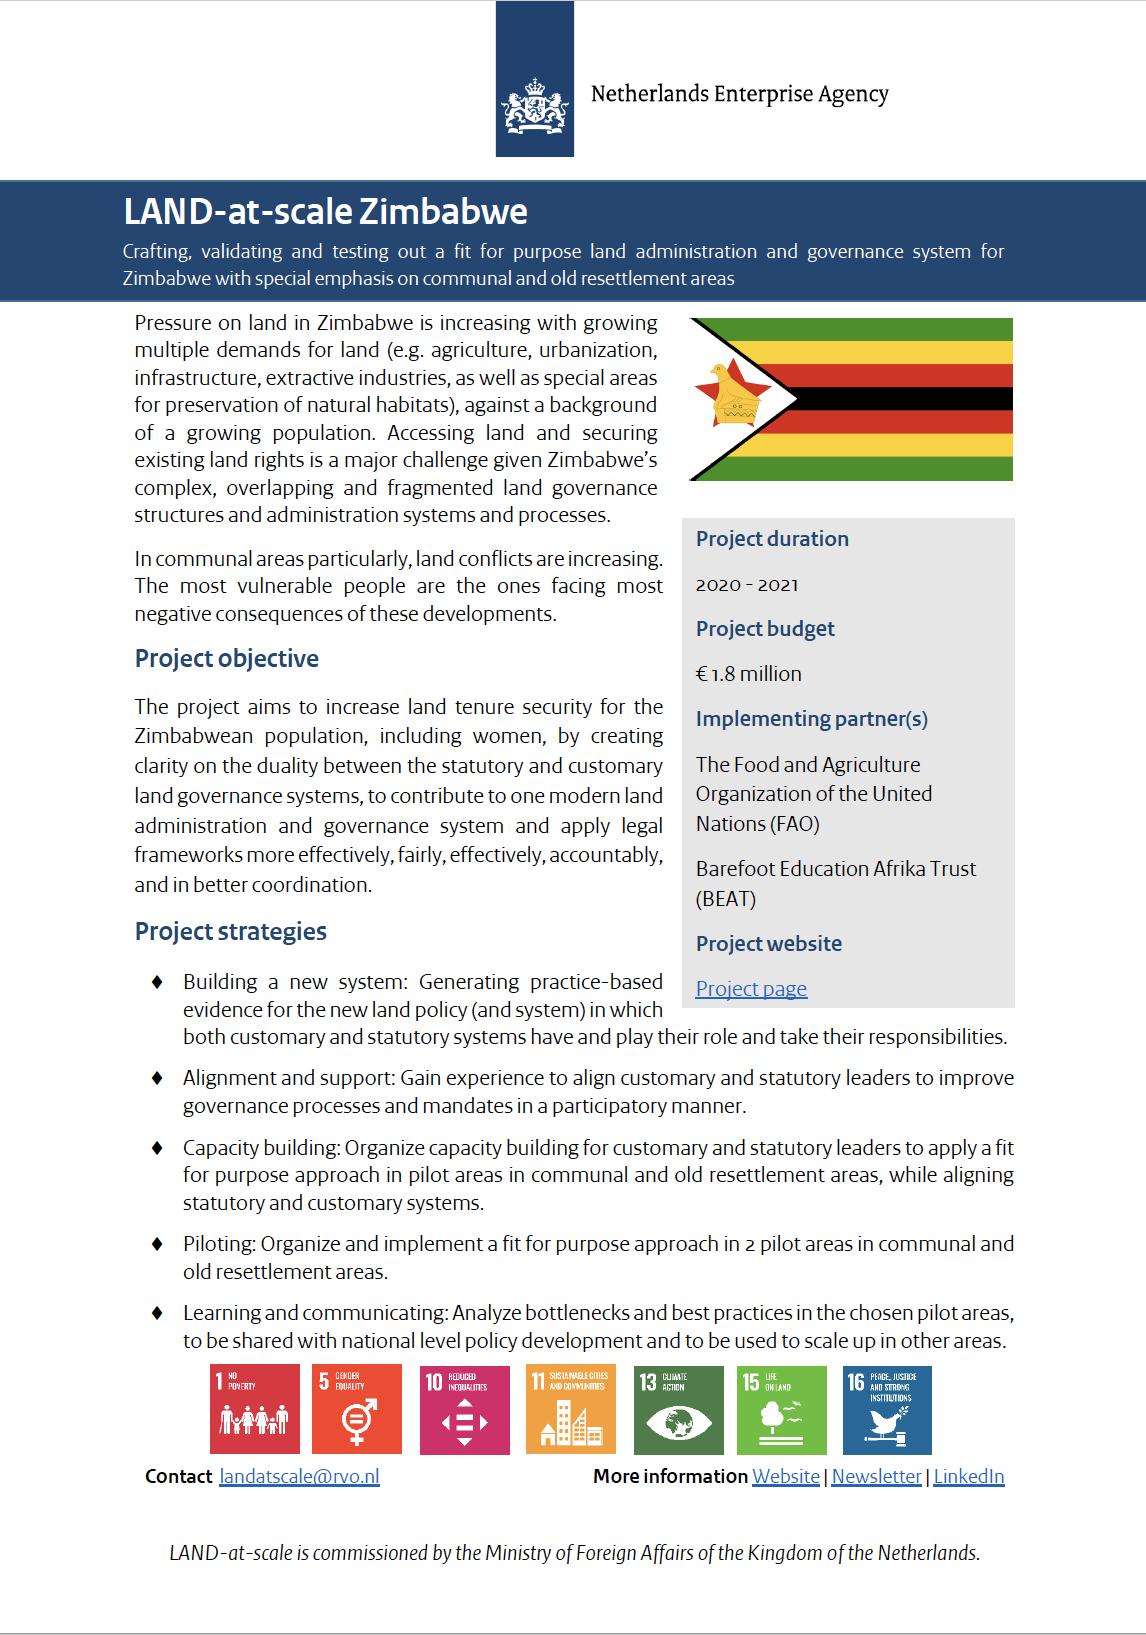 Land-at-scale Zimbabwe